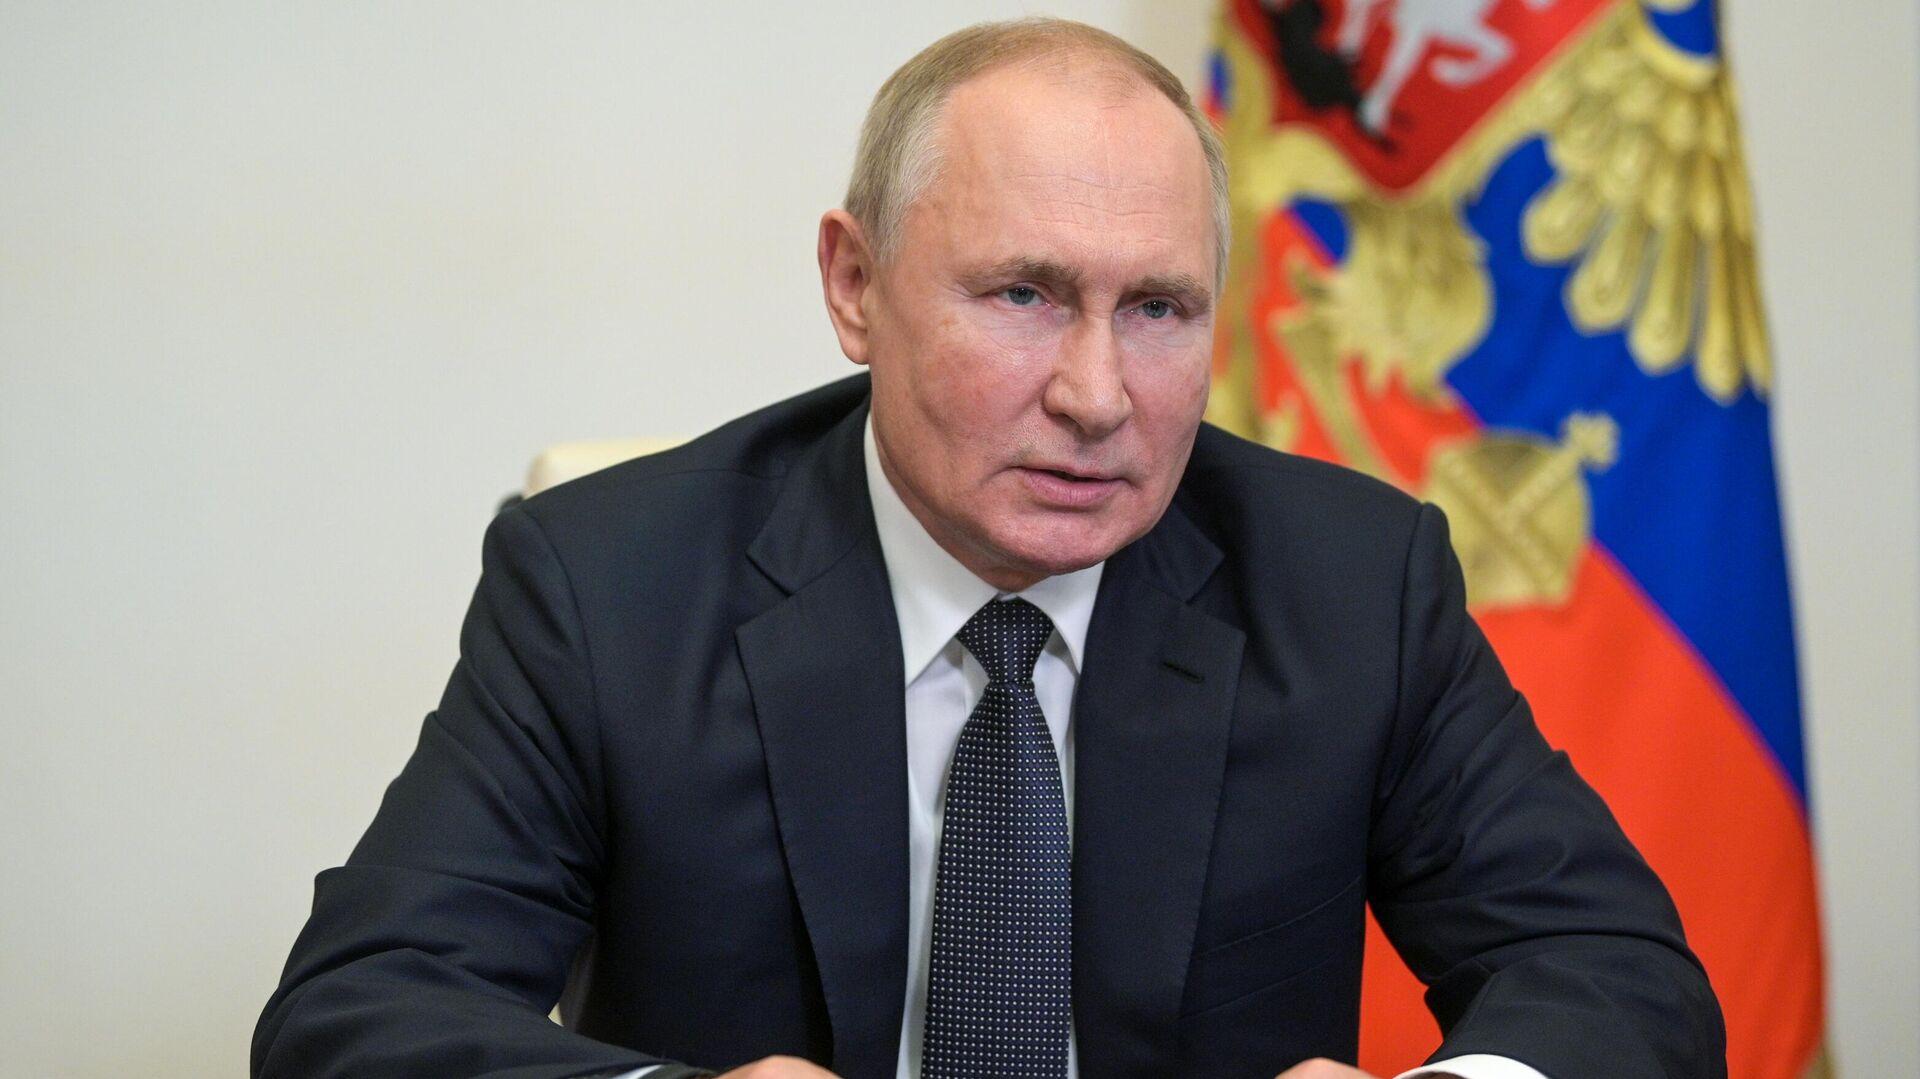 Vladímir Putin,  presidente de Rusia  - Sputnik Mundo, 1920, 30.09.2021